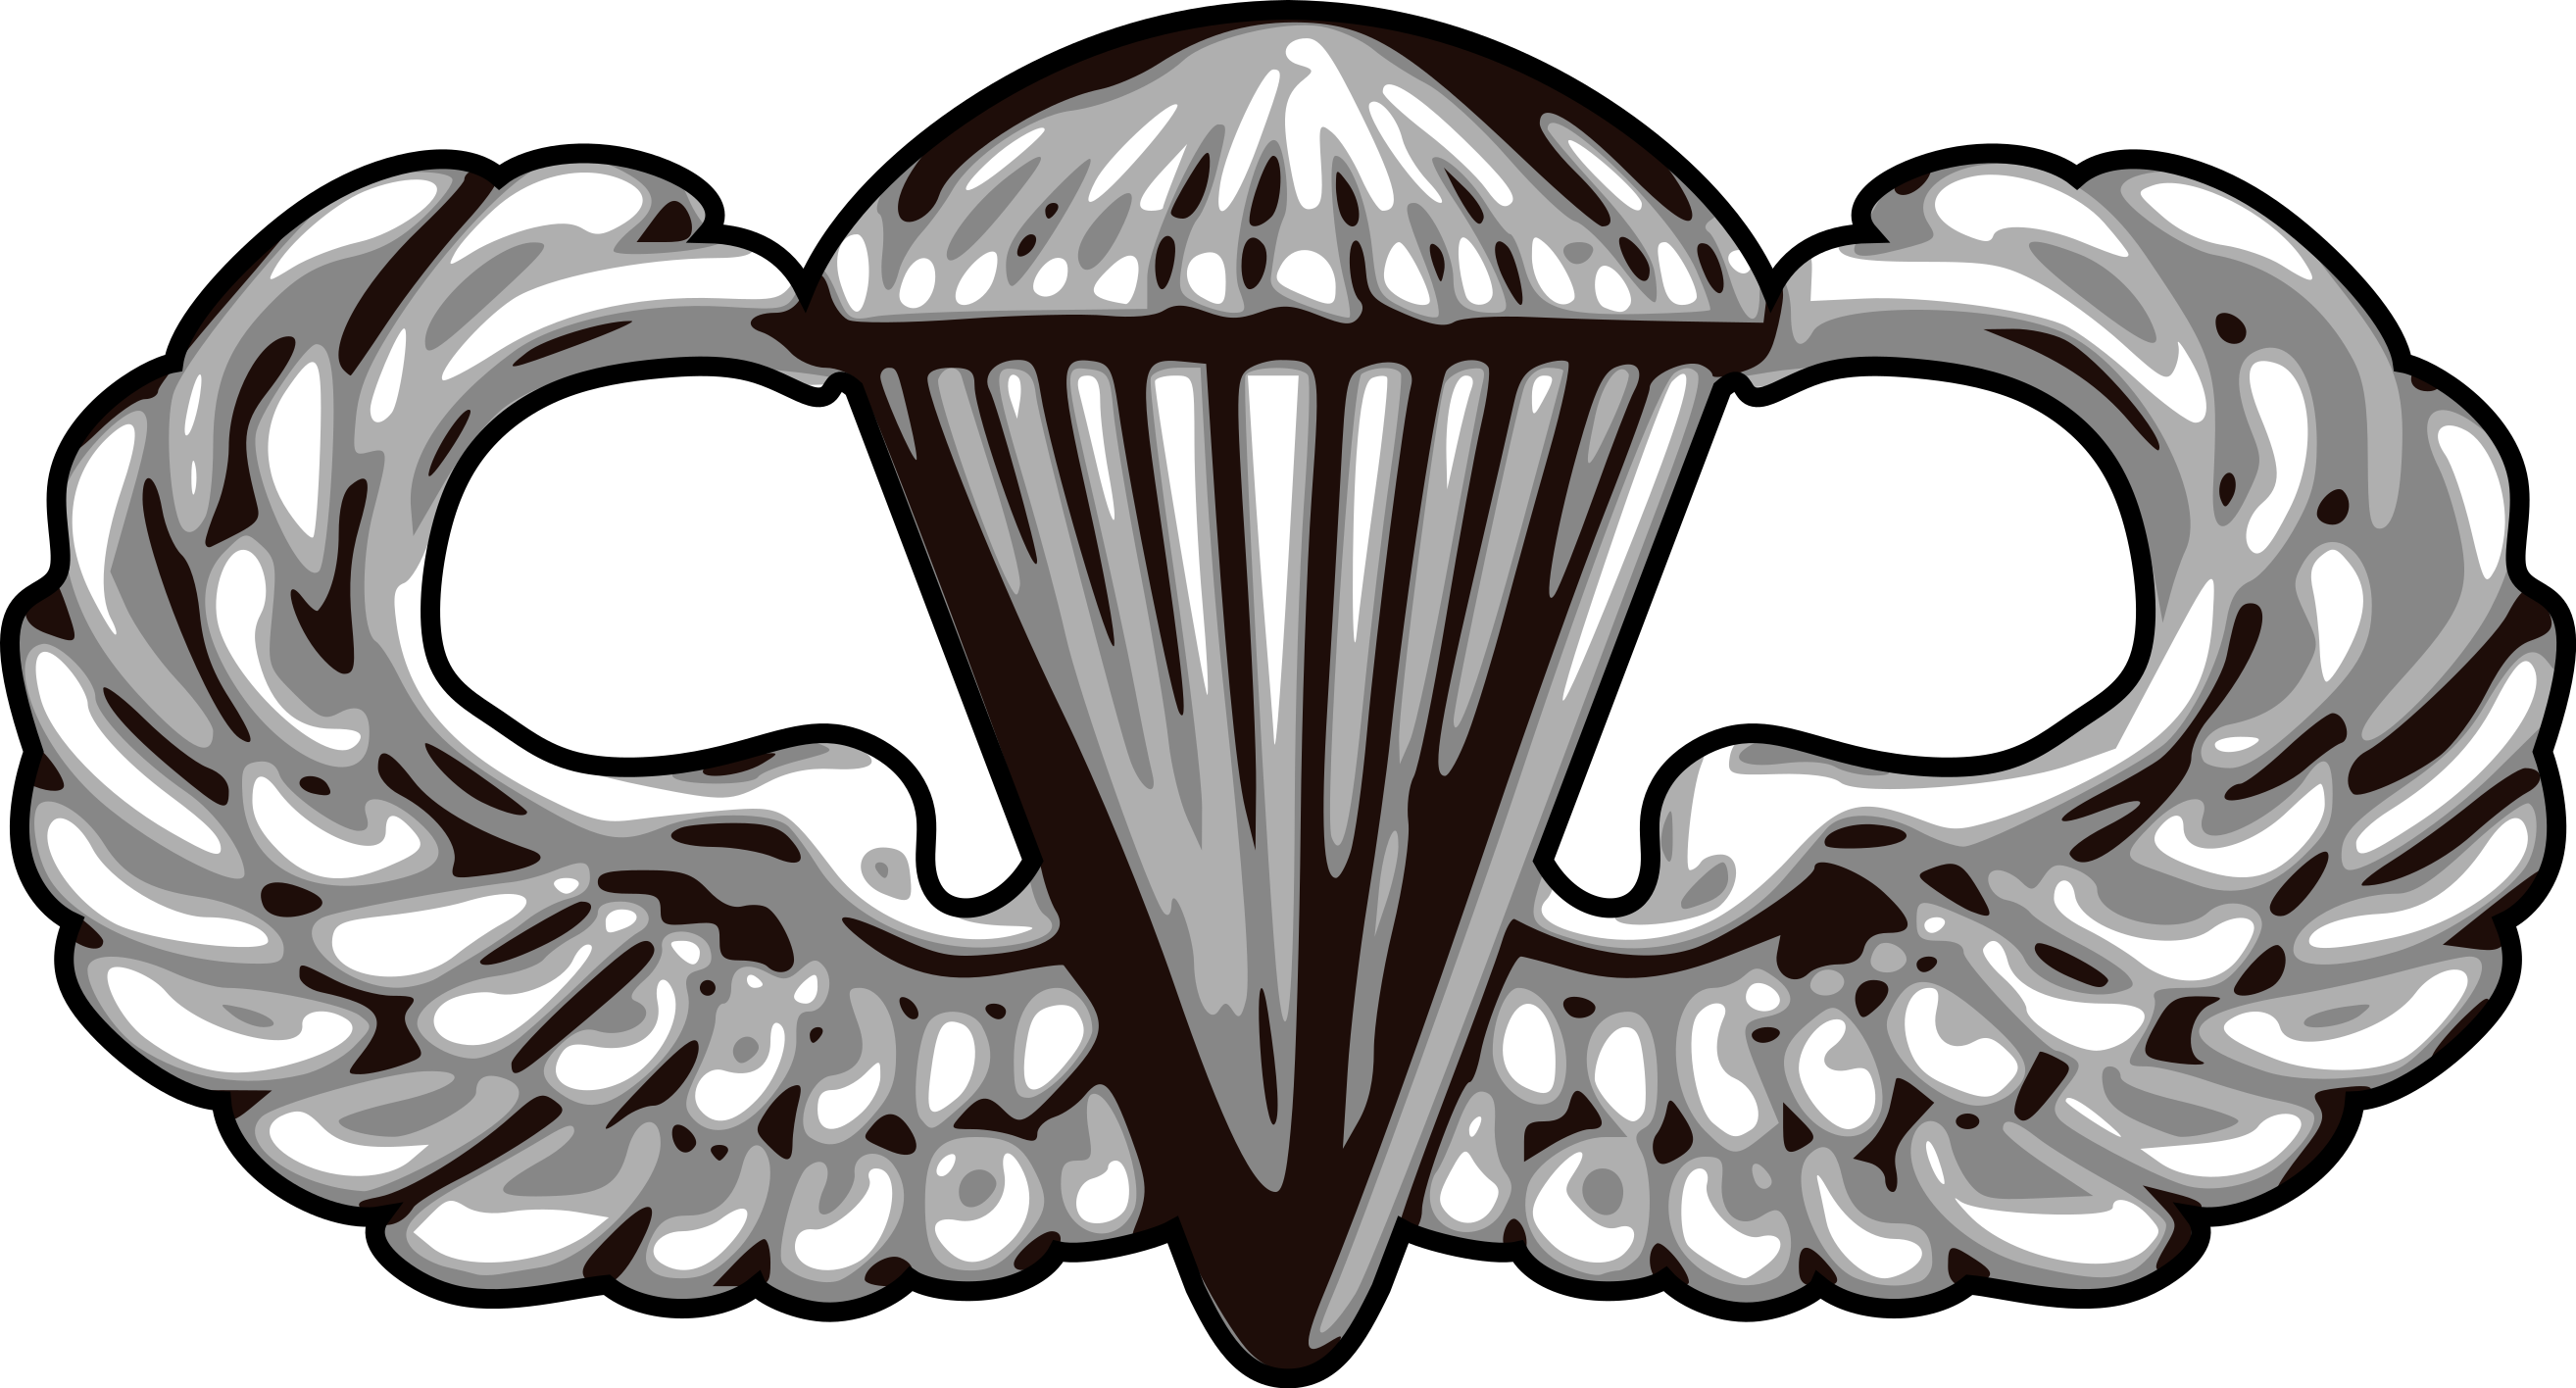 2628x1416 Fileus Army Airborne Basic Parachutist Badge Vector.svg